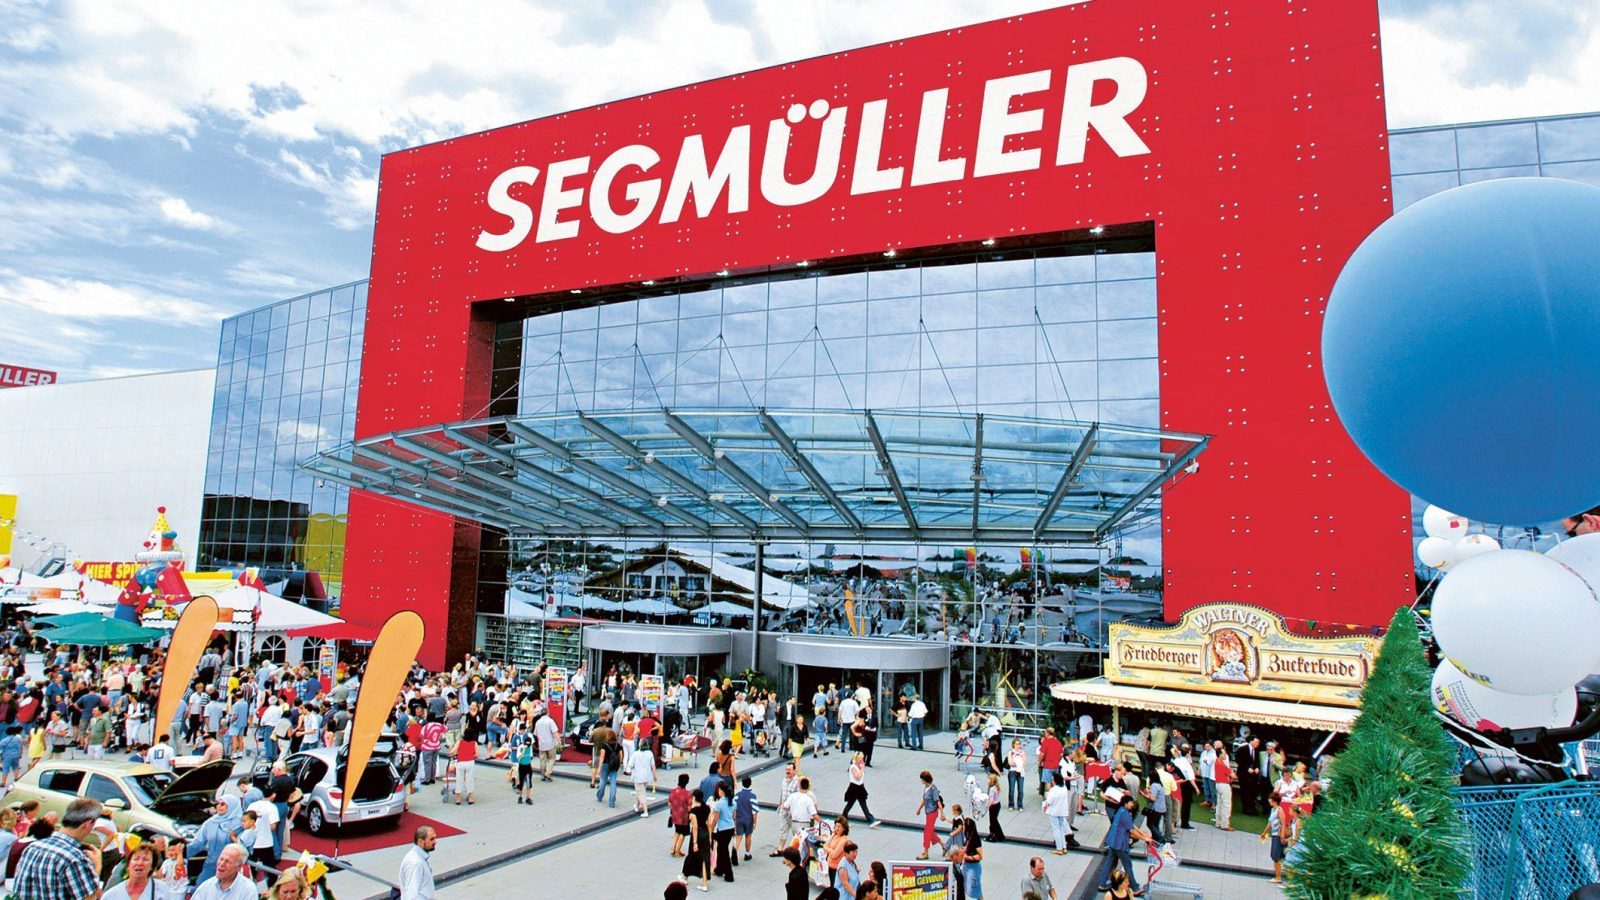 Emejing Segmller Kchen Weiterstadt Gallery Rellik Rellik